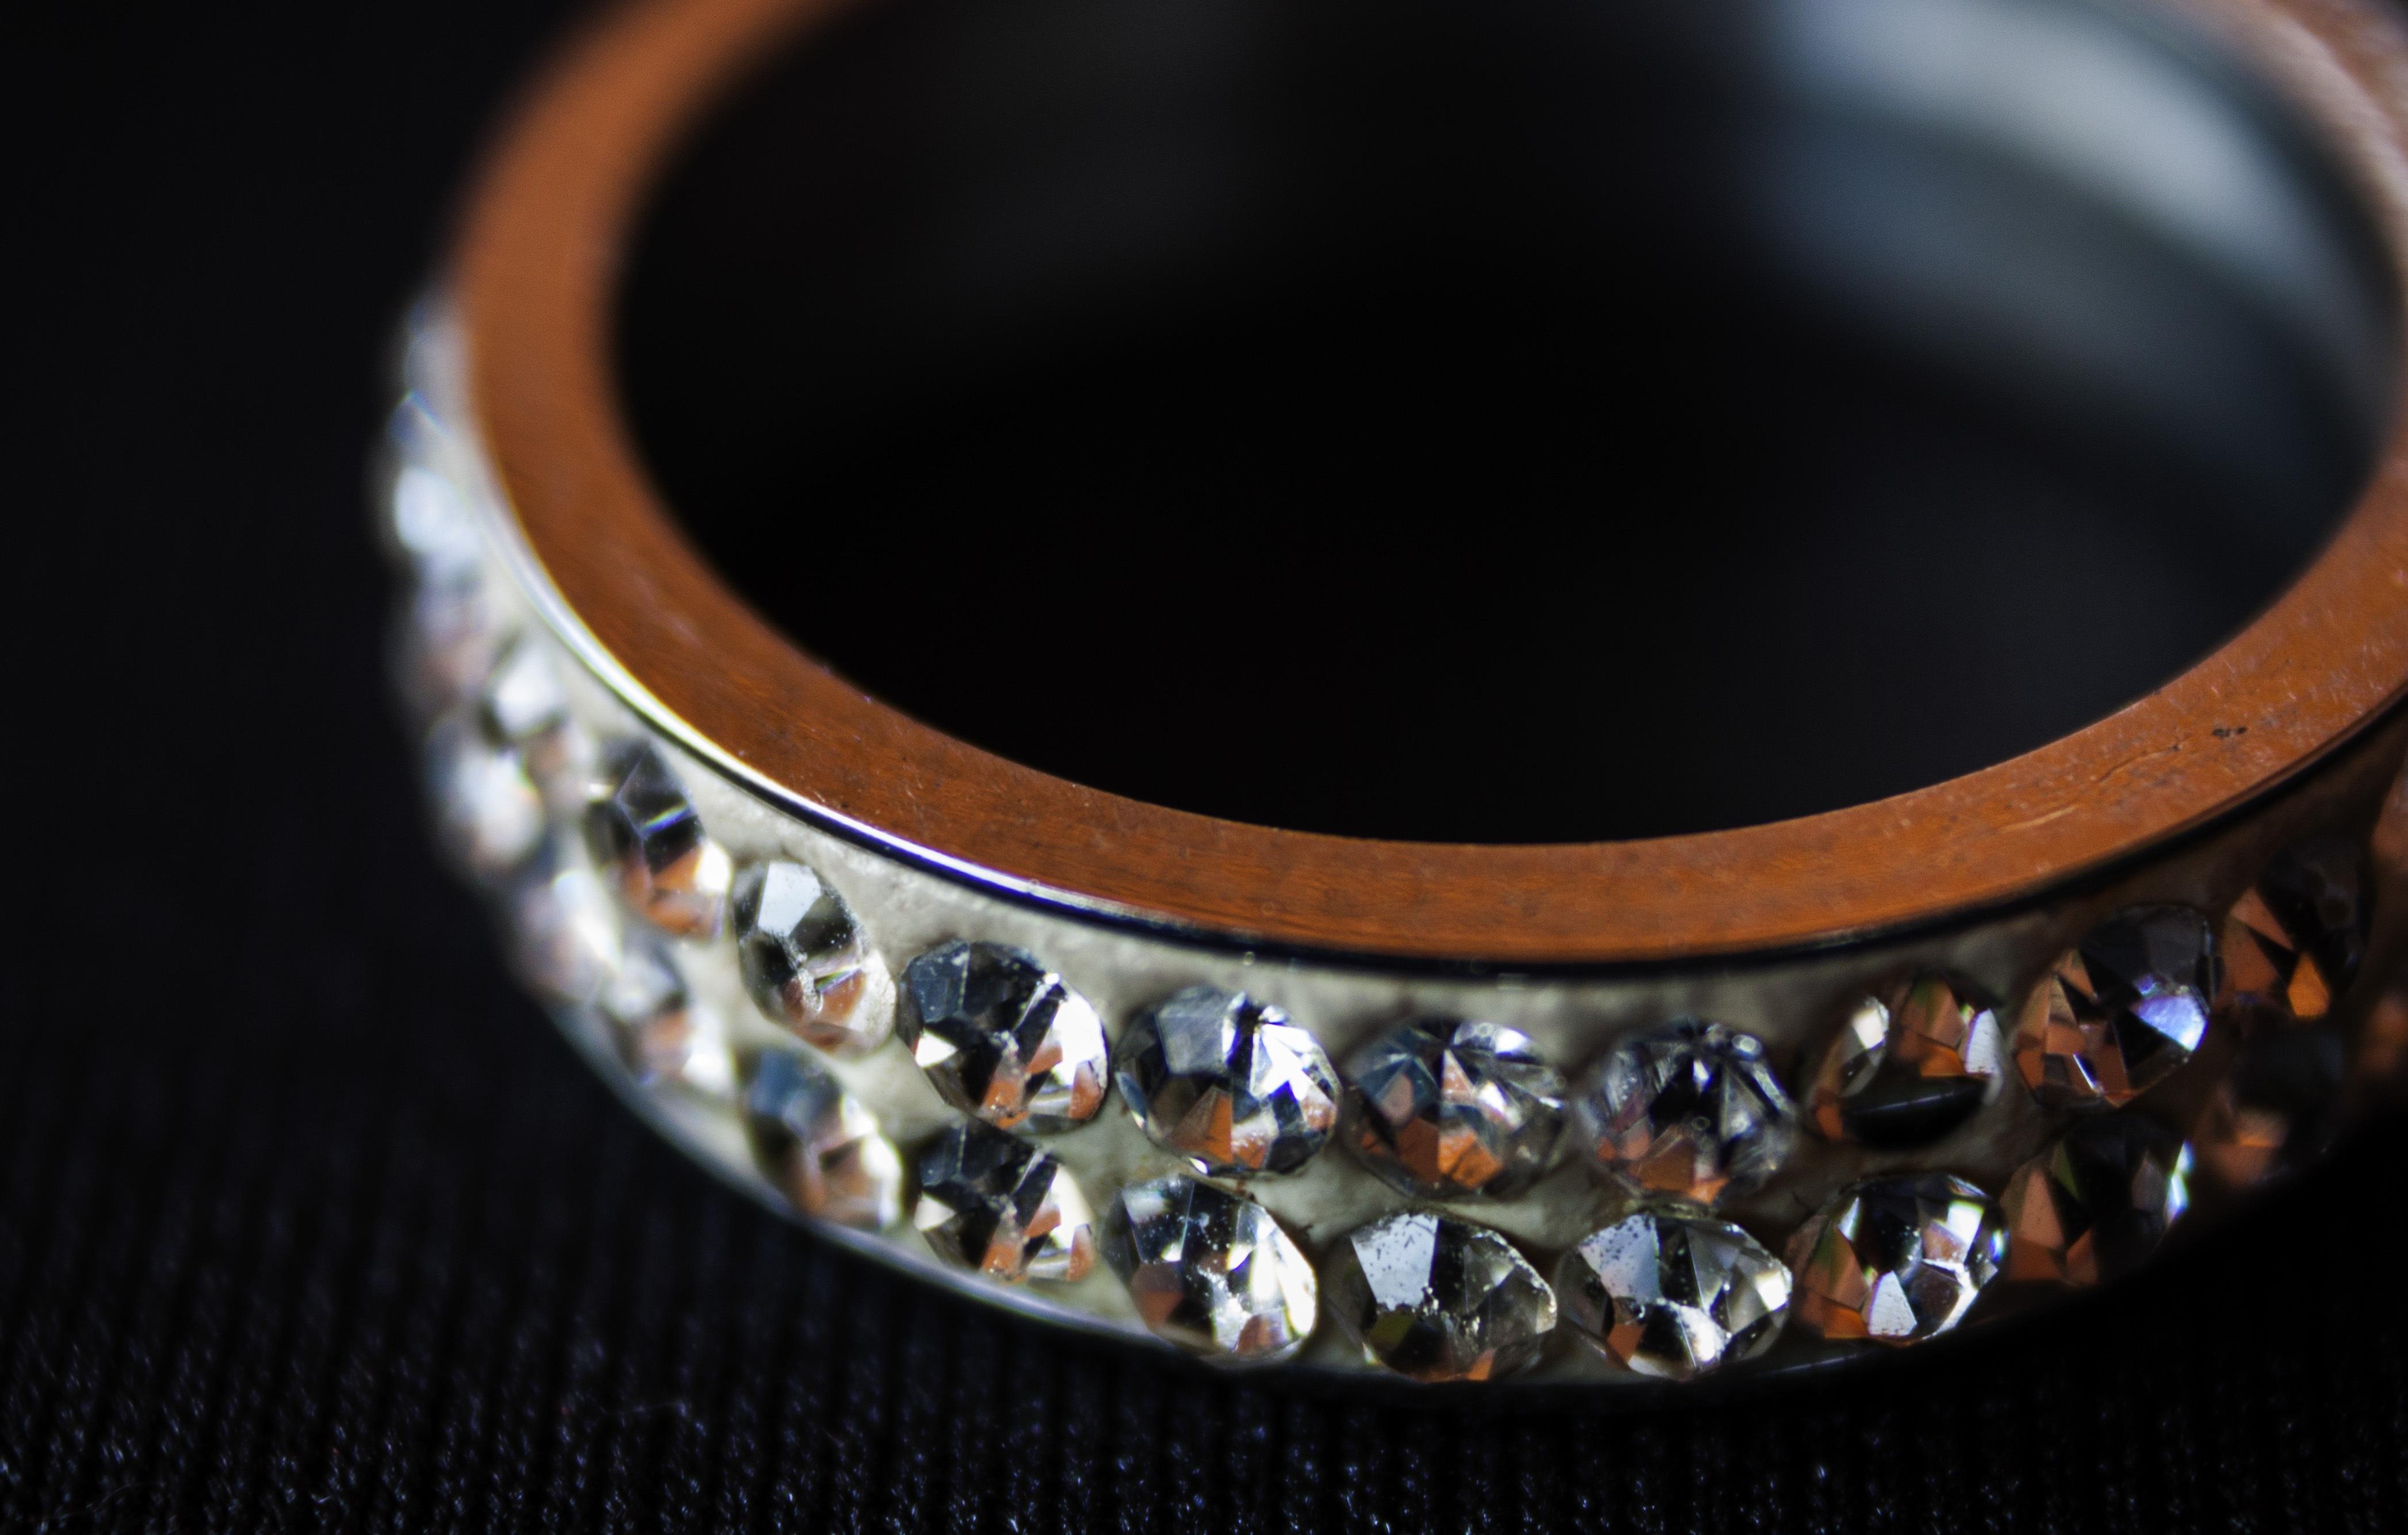 Ring Stone Metal Commitment Bangle Bracelet Close Up Jewellery Jewel Cool Image Silver Rings I Diamonds